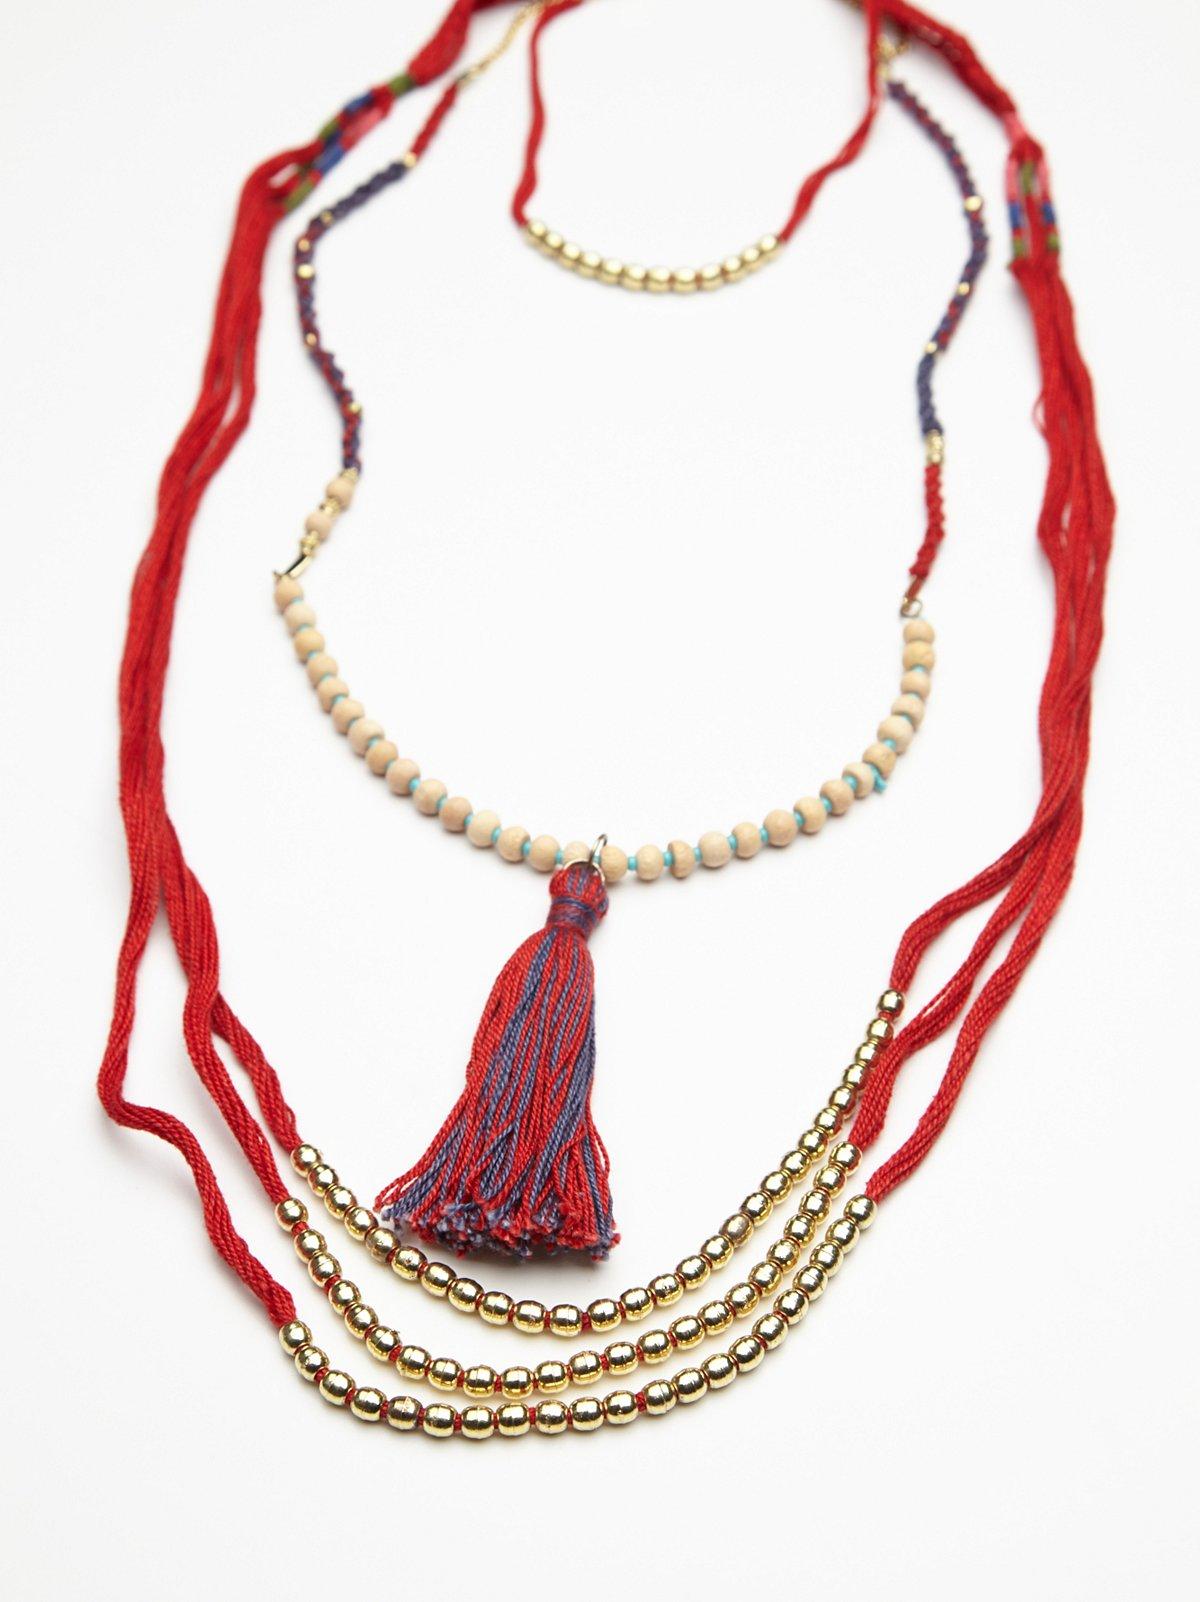 Bali Breeze Necklace